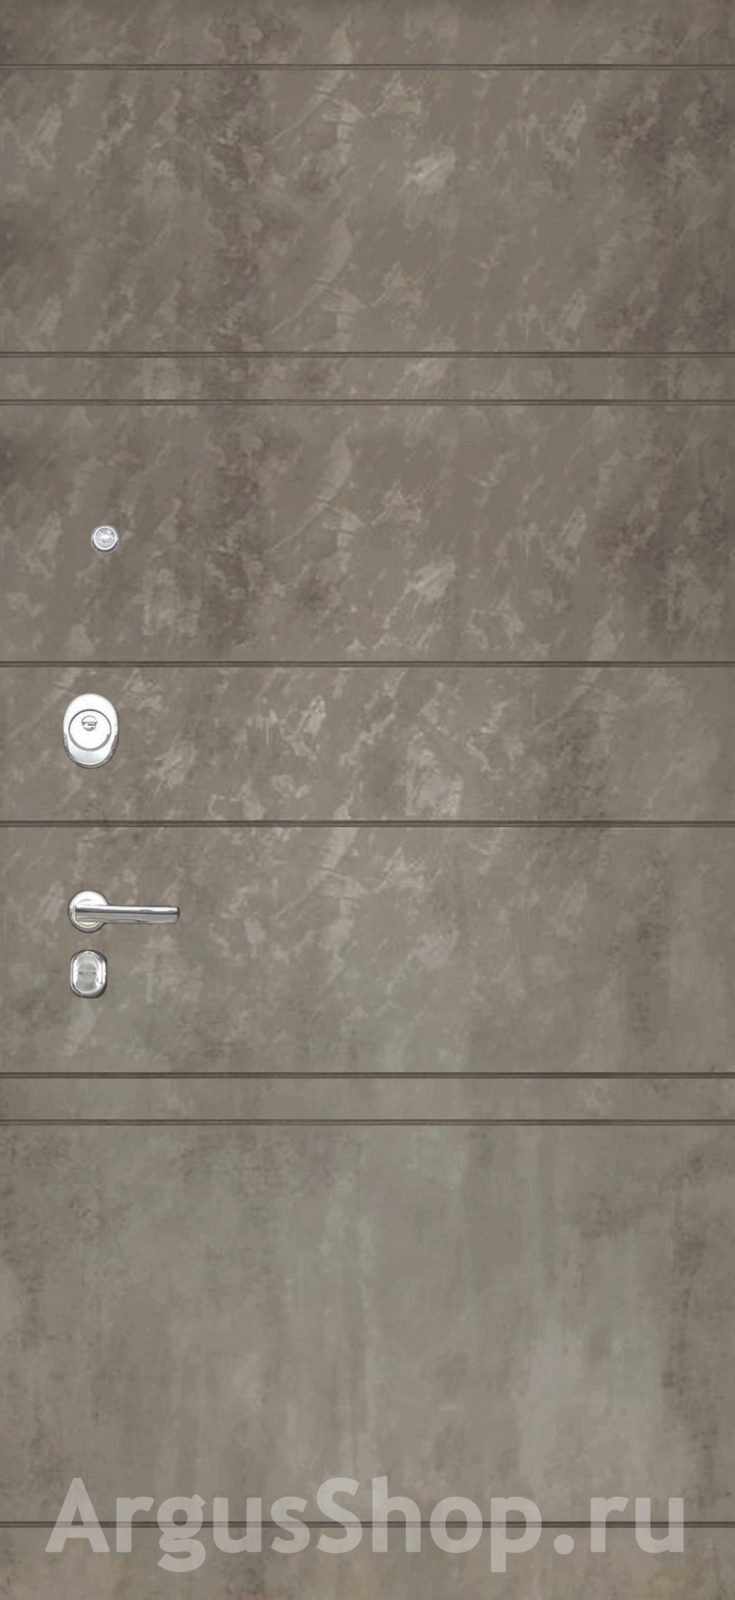 Двери Аргус Агат Дуо Тёмный бетон